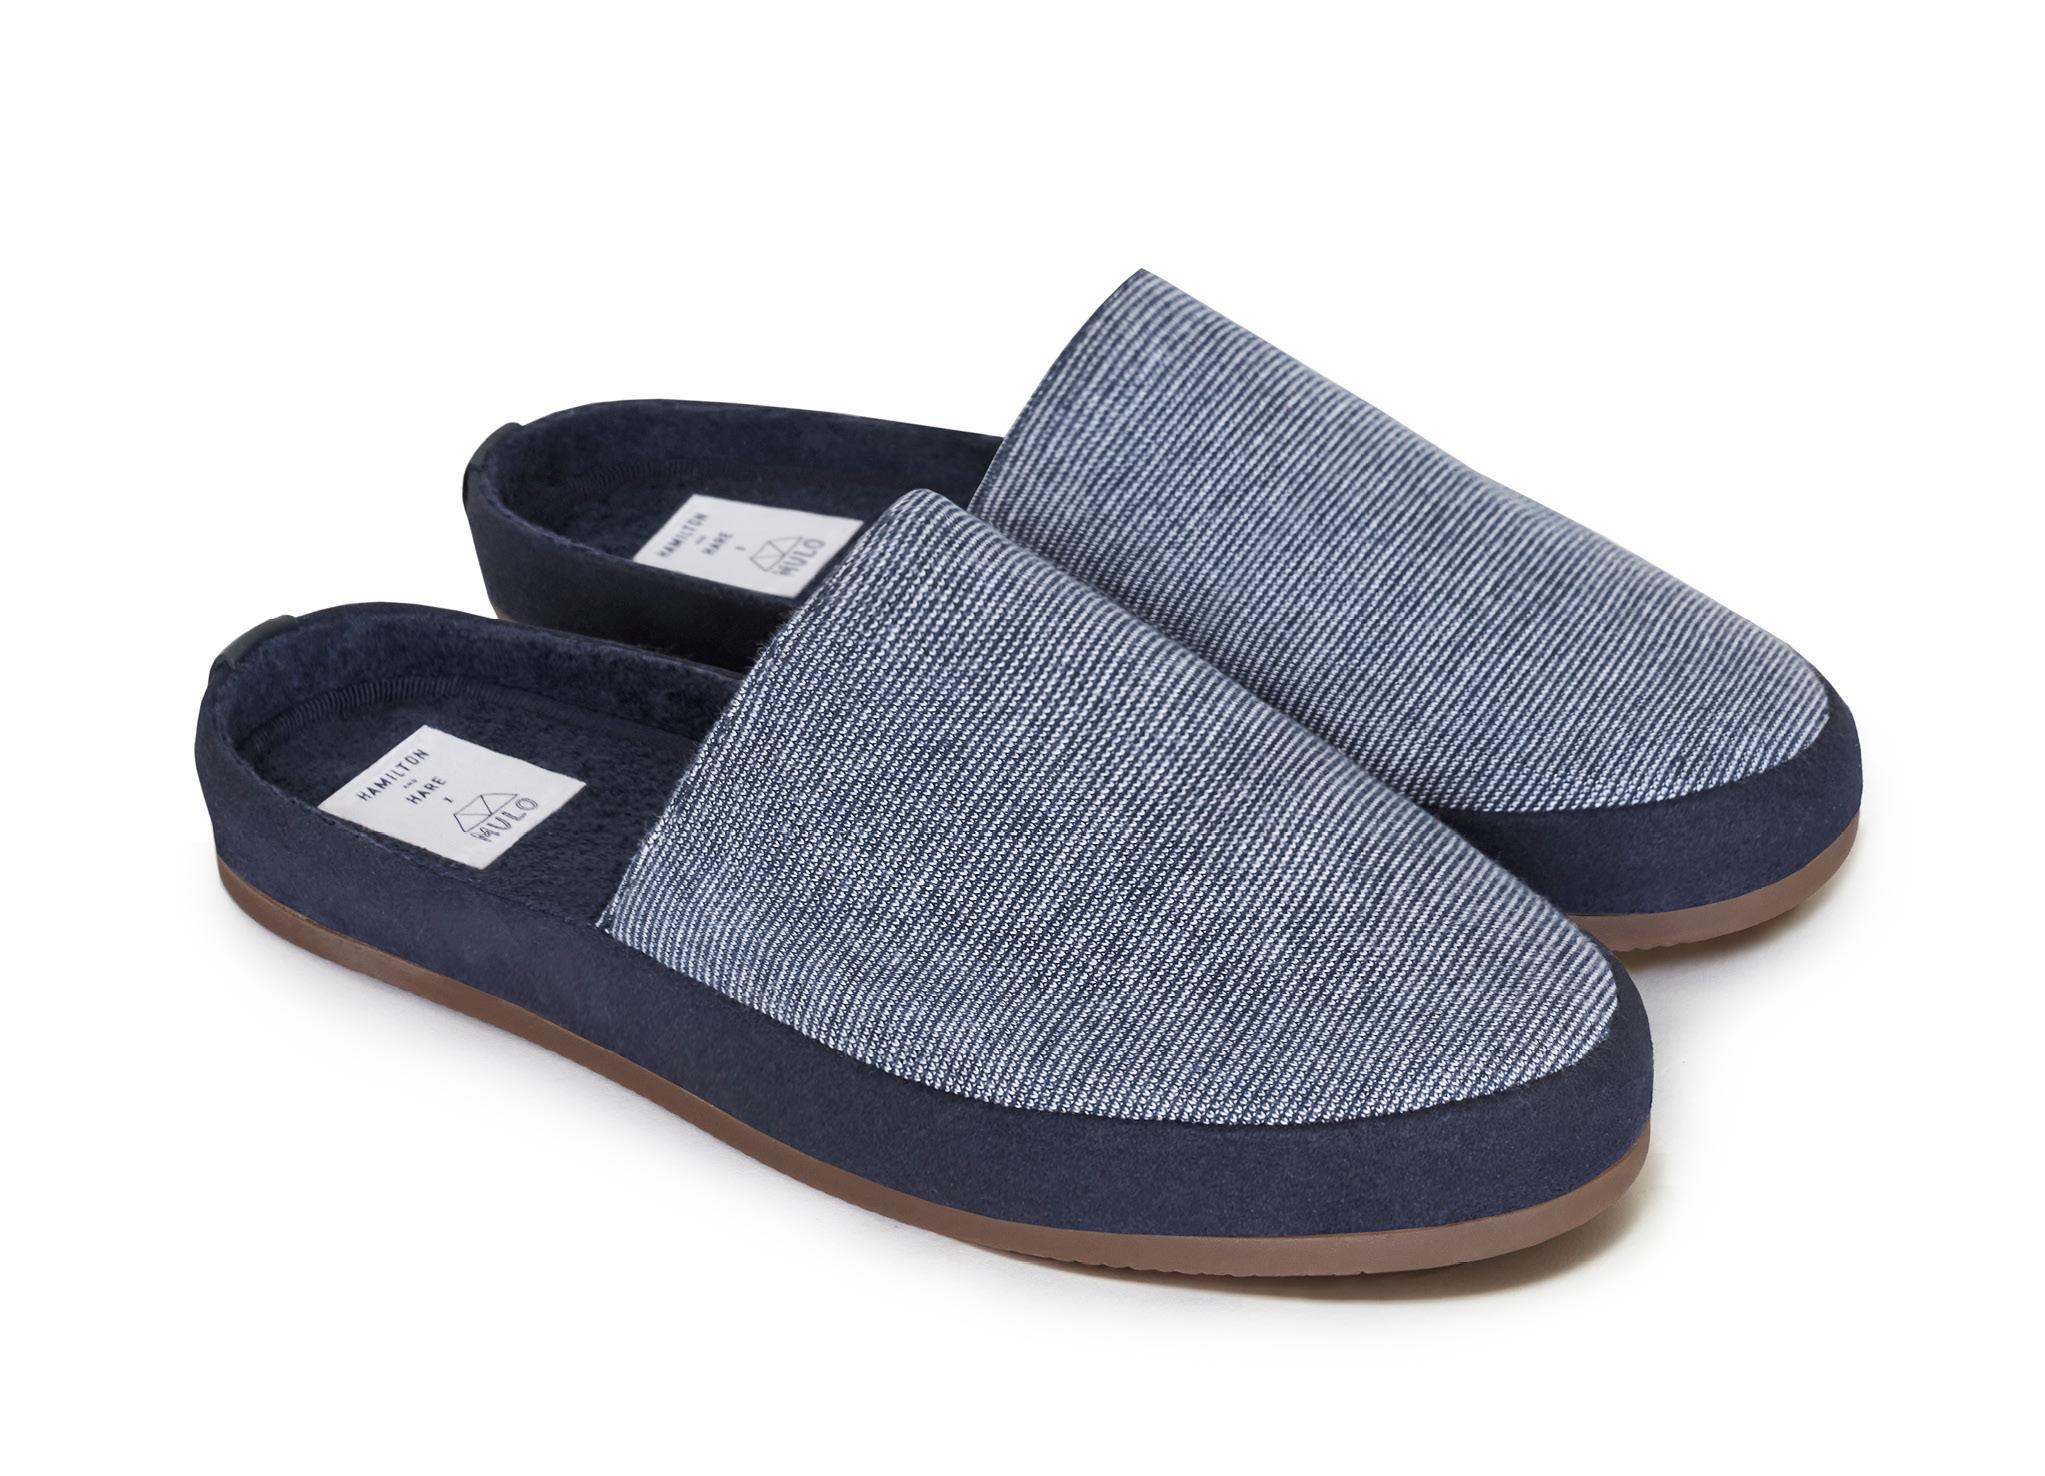 Blue Striped Backless Slippers for Men